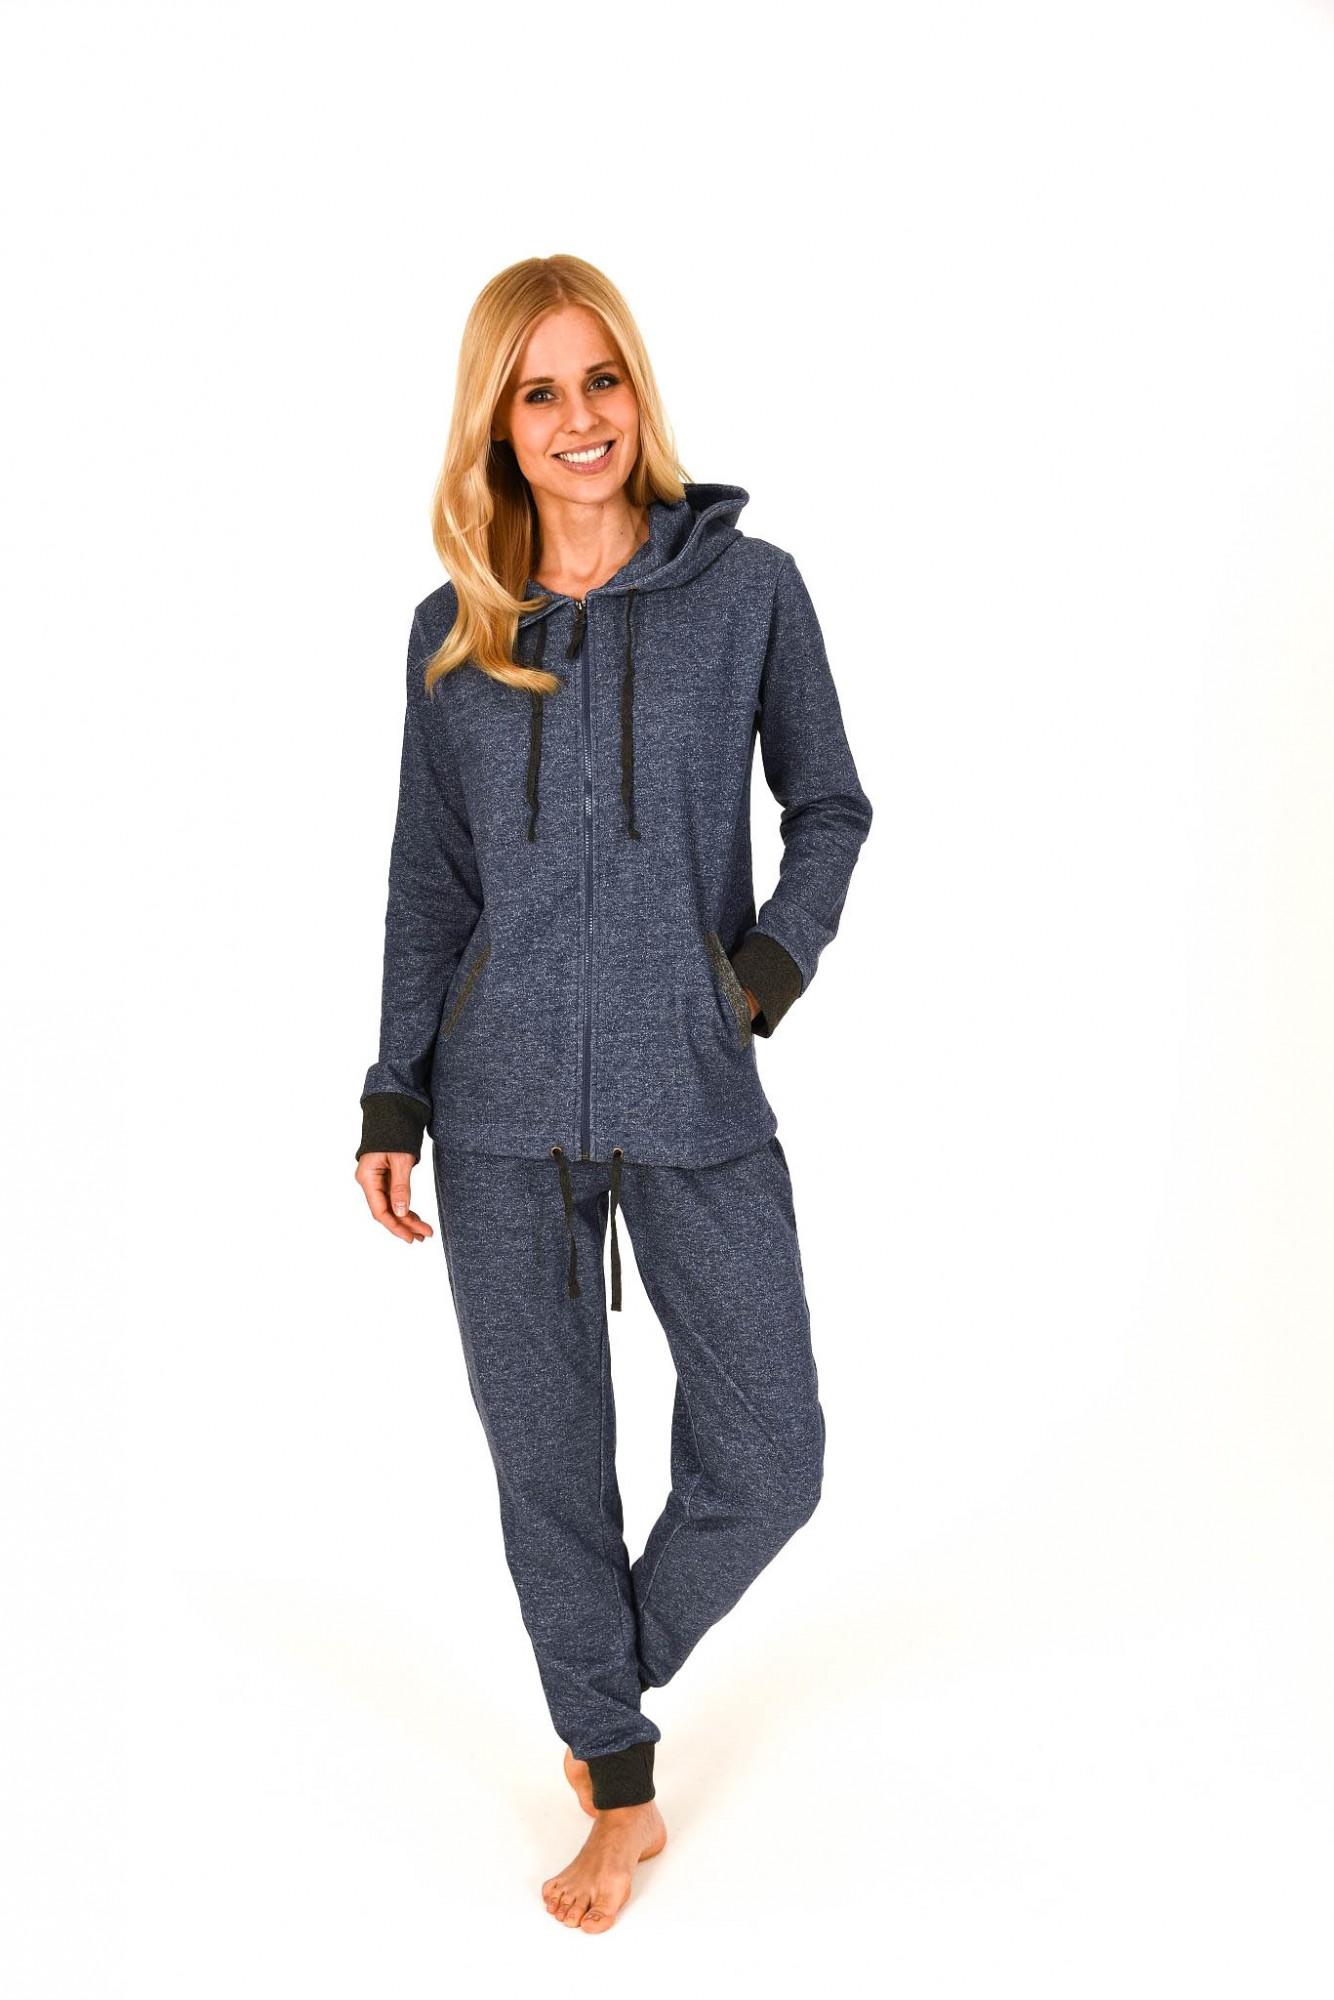 Damen Loungewear Hausanzug aus French Terry – 261 216 99 444 – Bild 1